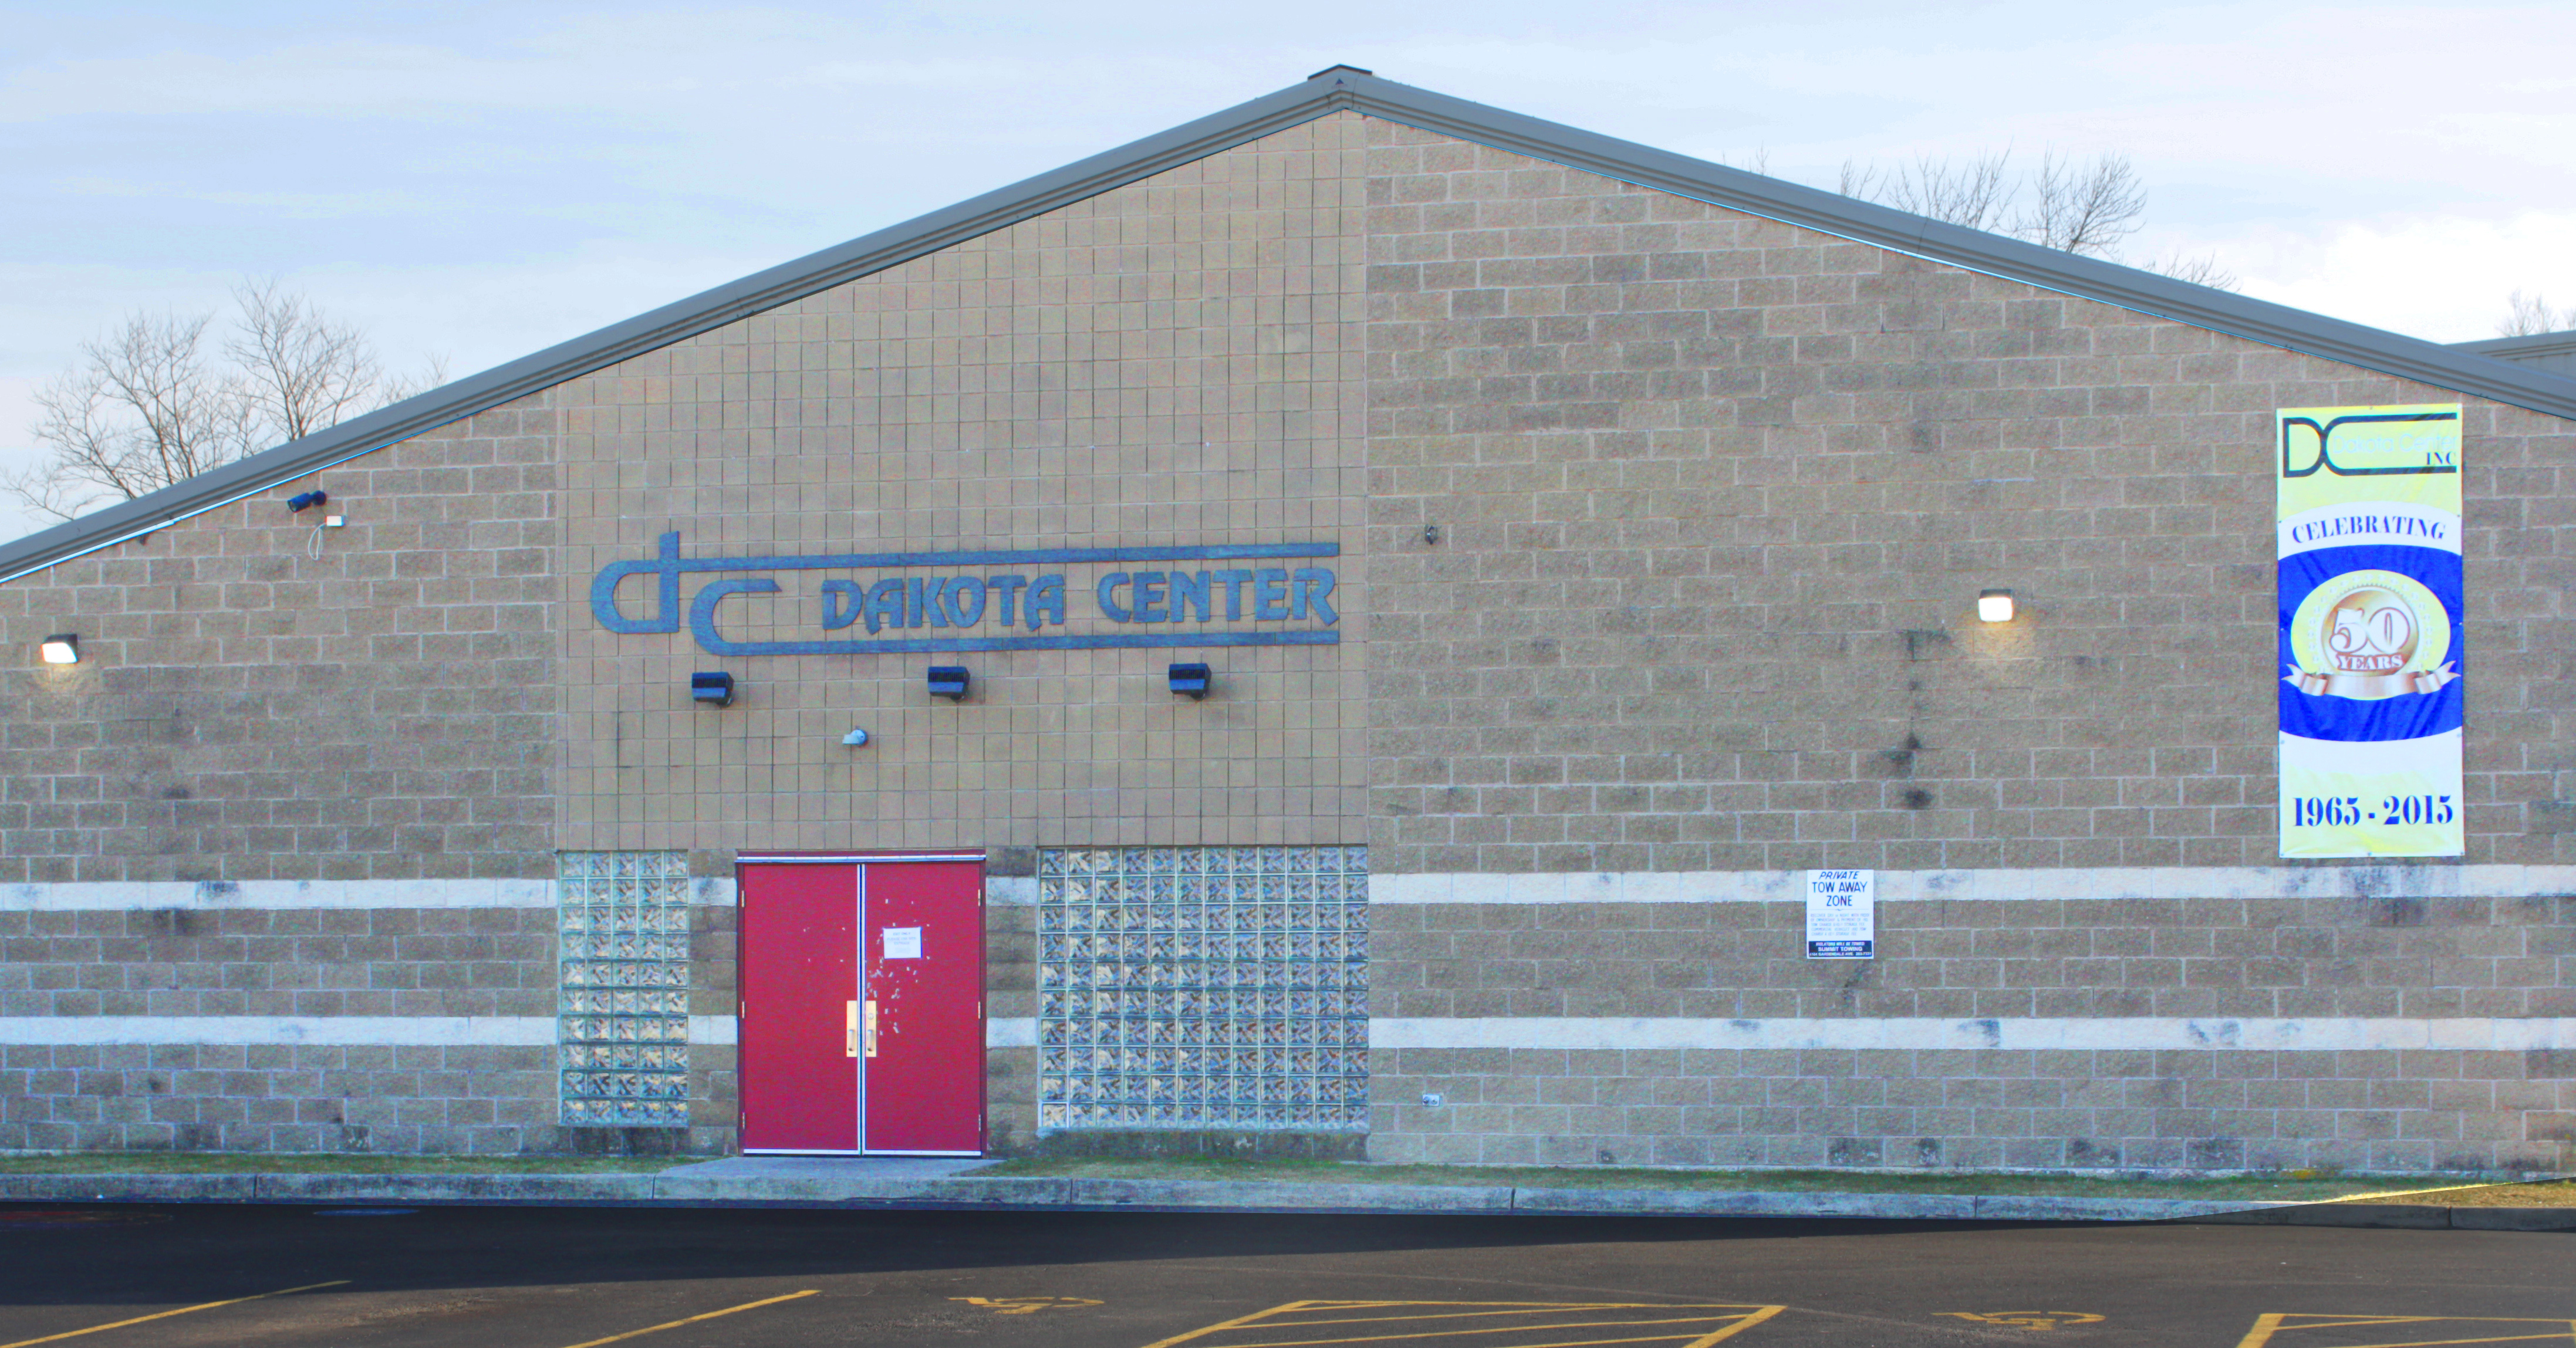 Dakota Center building exterior